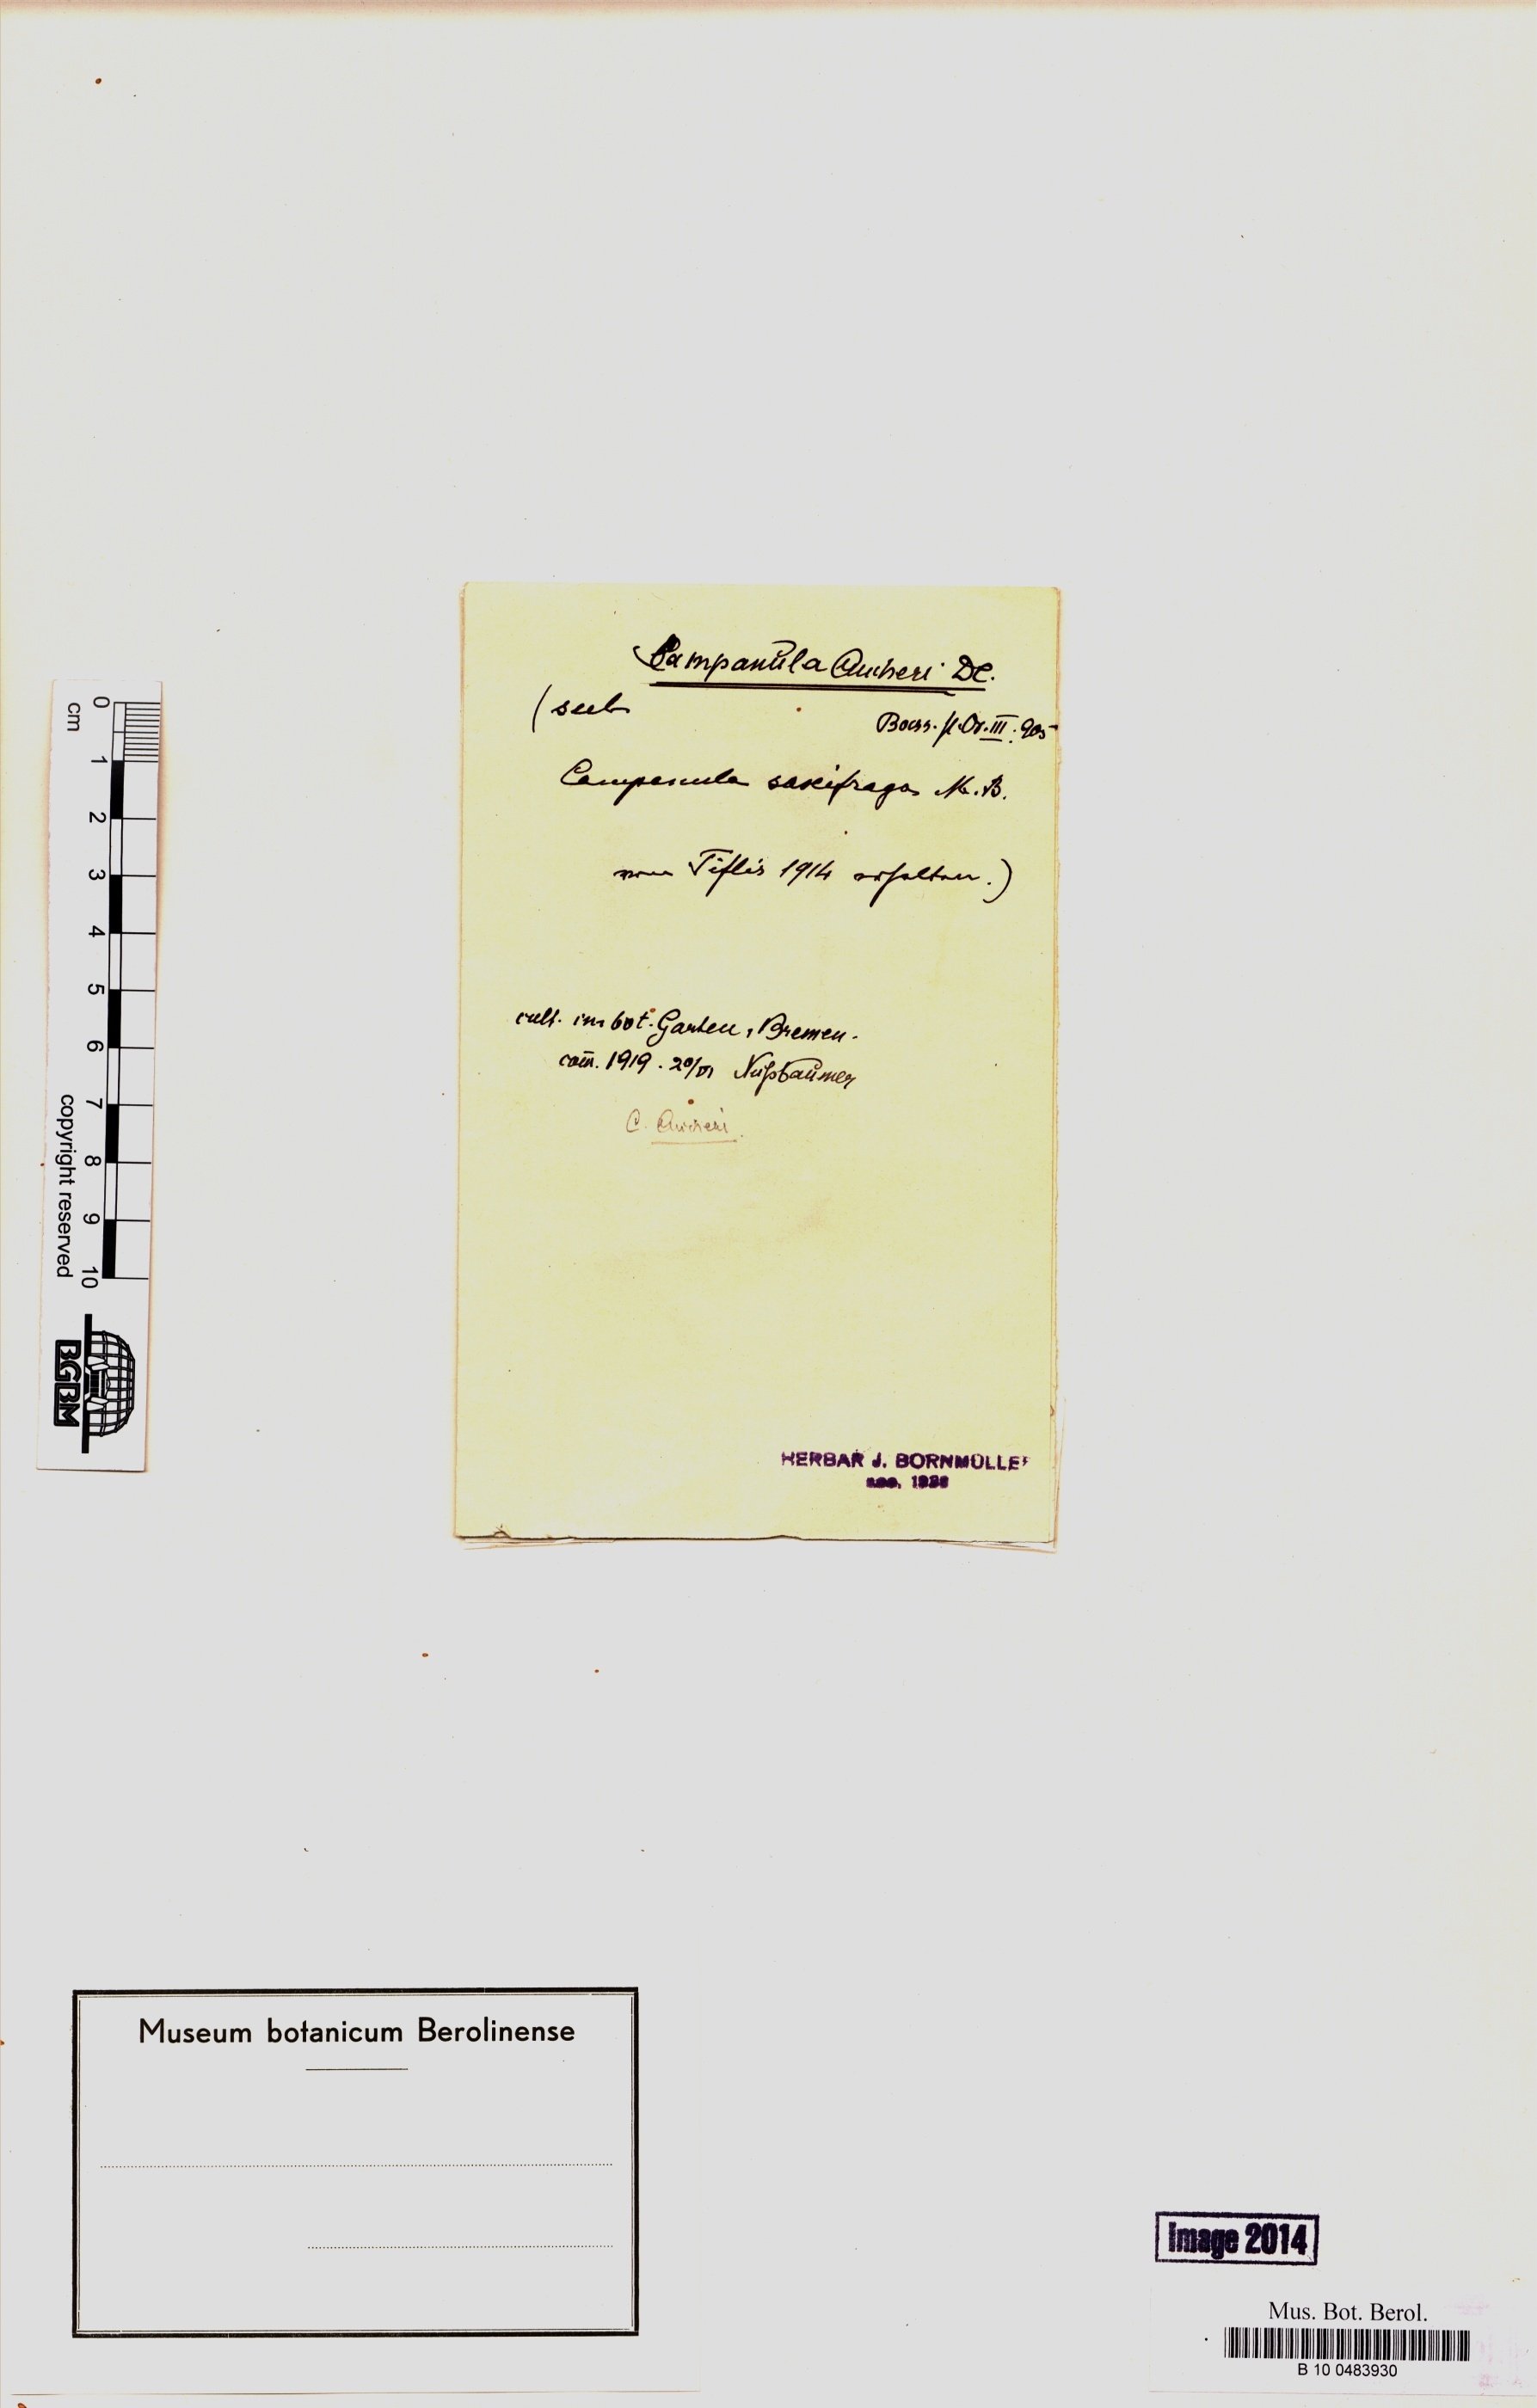 http://ww2.bgbm.org/herbarium/images/B/10/04/83/93/B_10_0483930__1.jpg